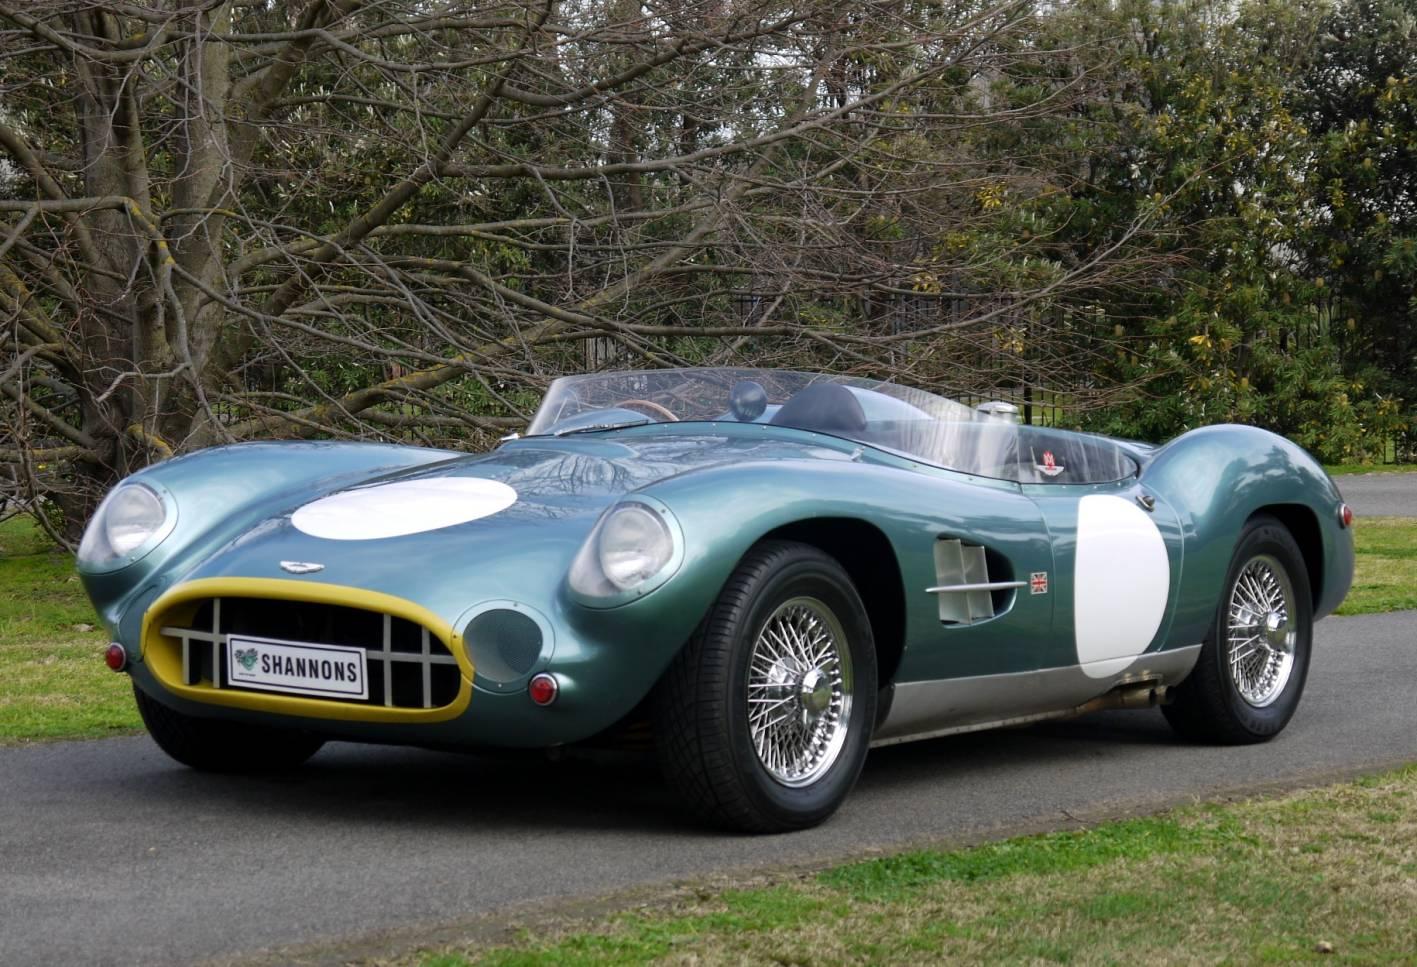 For Sale Immaculate Aston Martin Dbr2 Replica